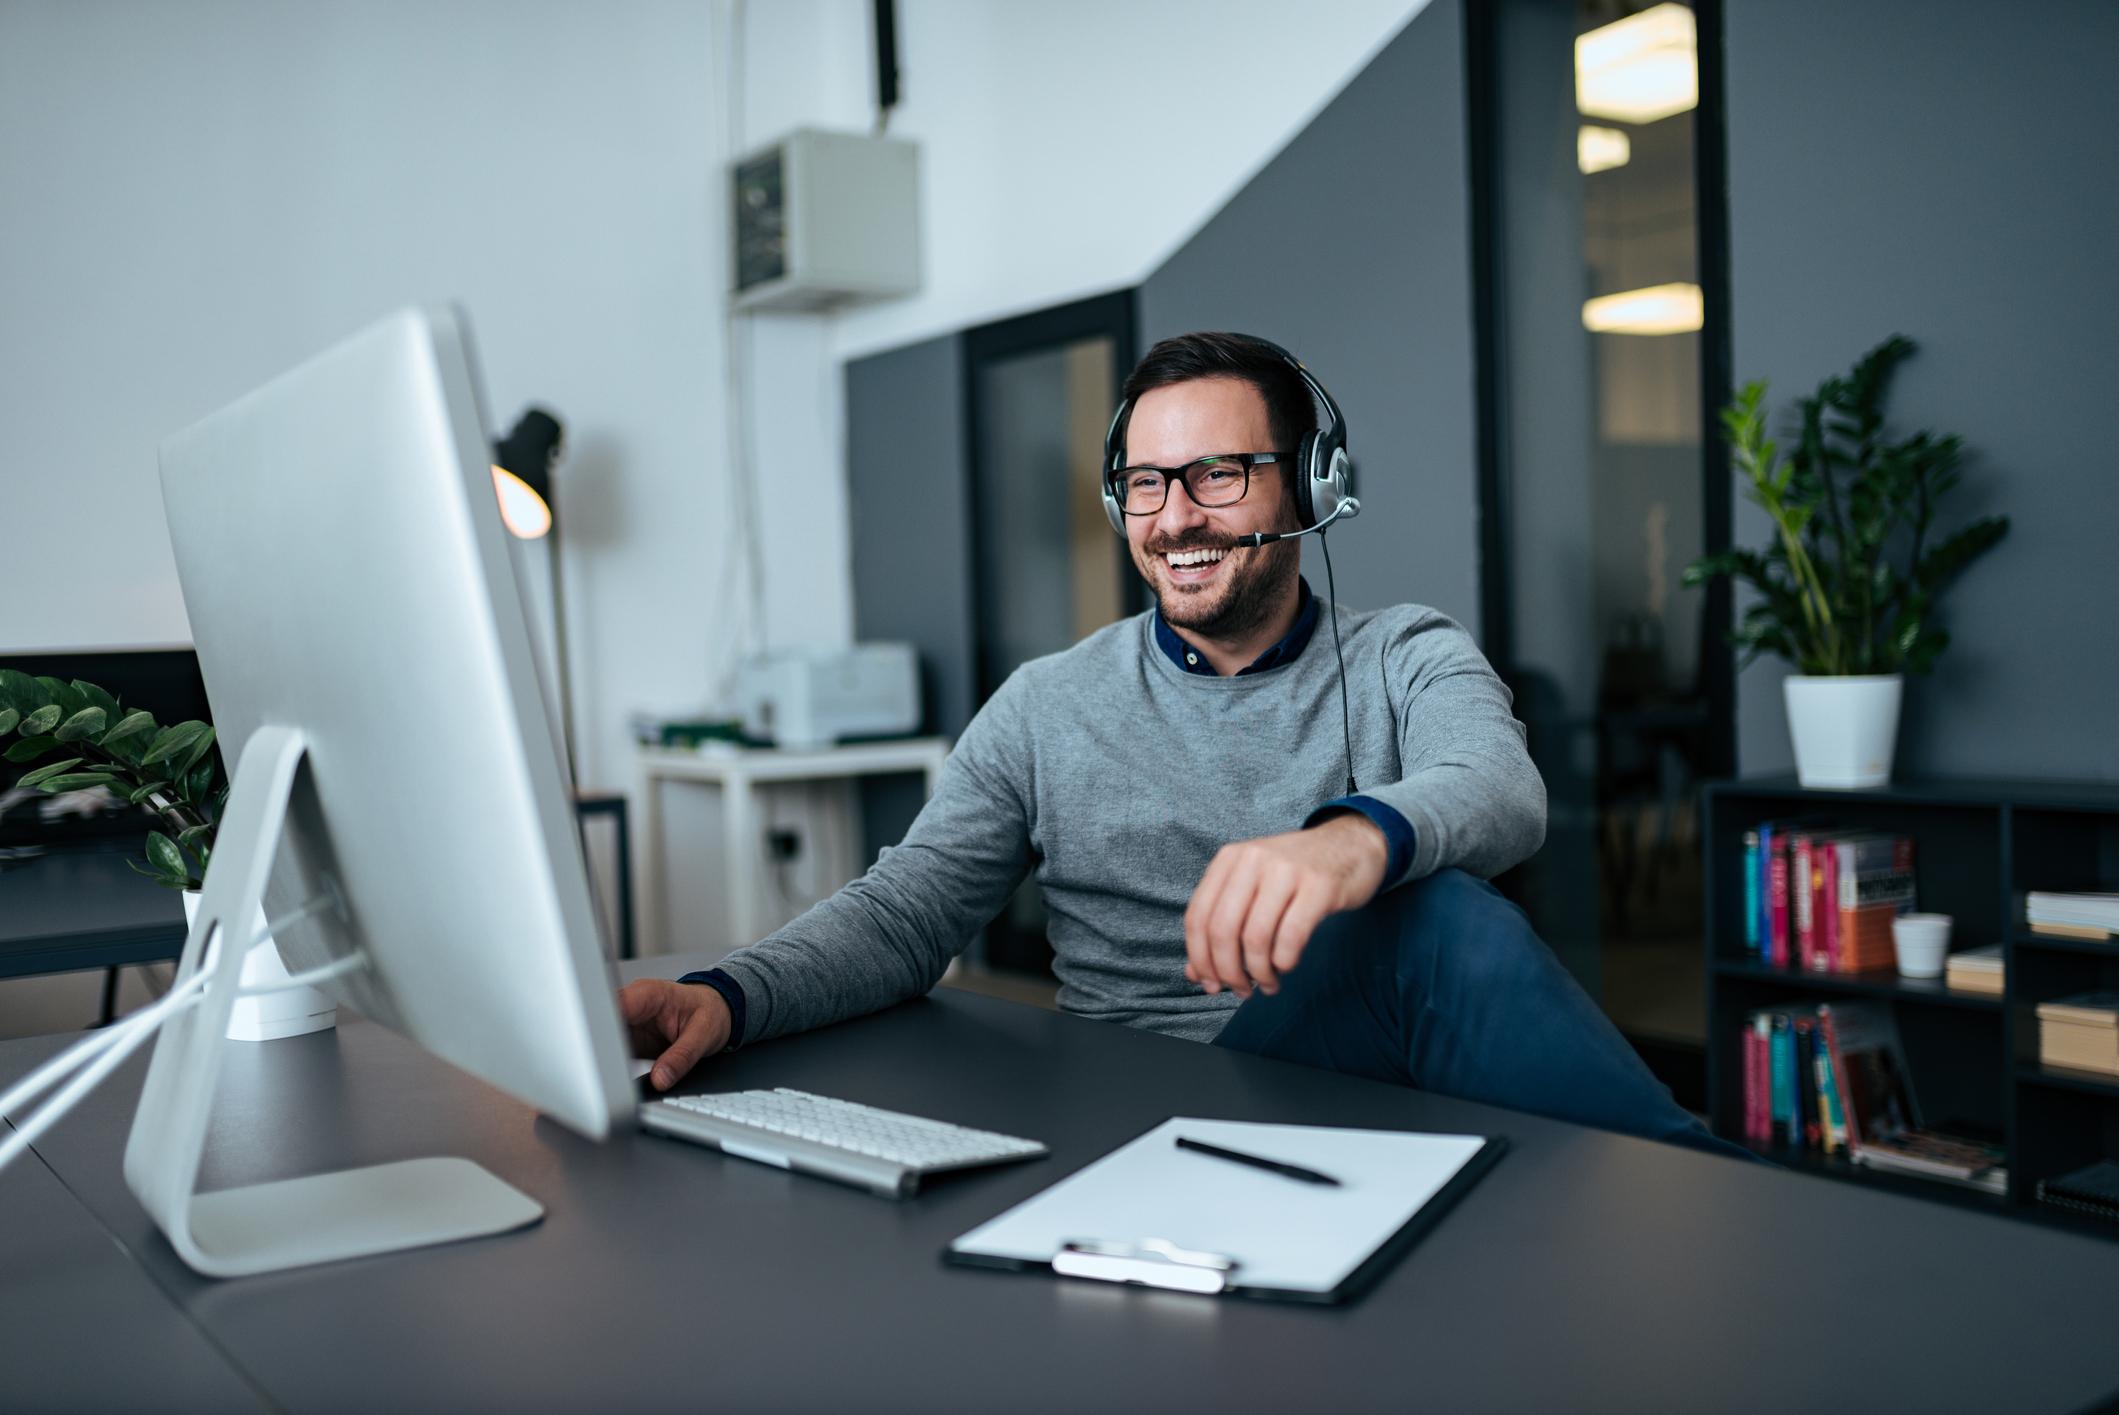 Slik skaper du mer effektive videokonferanser